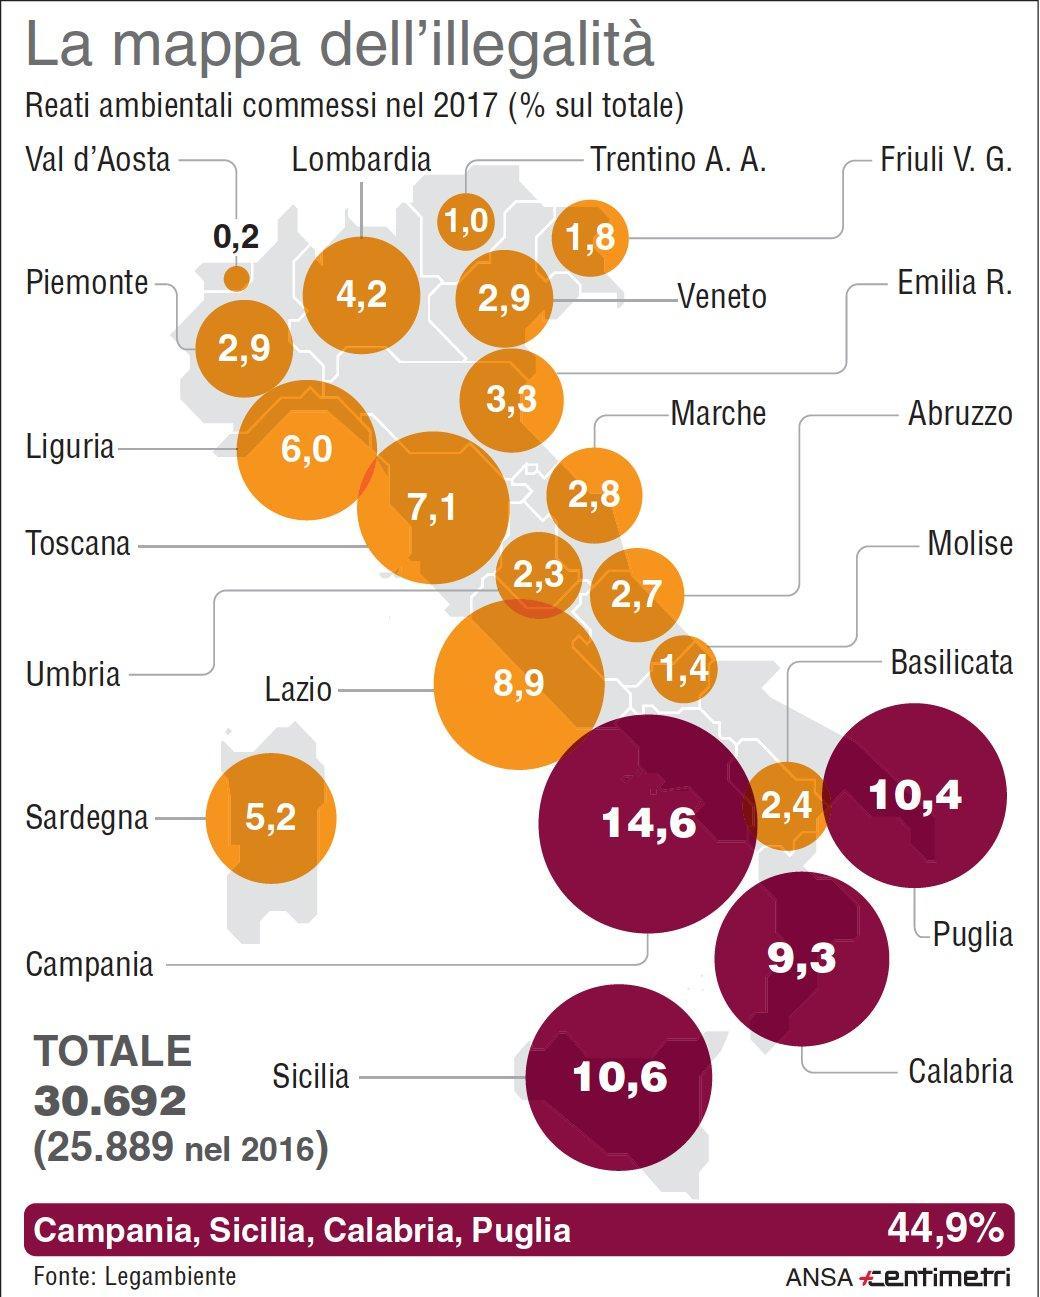 Reati ambientali 2017: le regioni più criminali